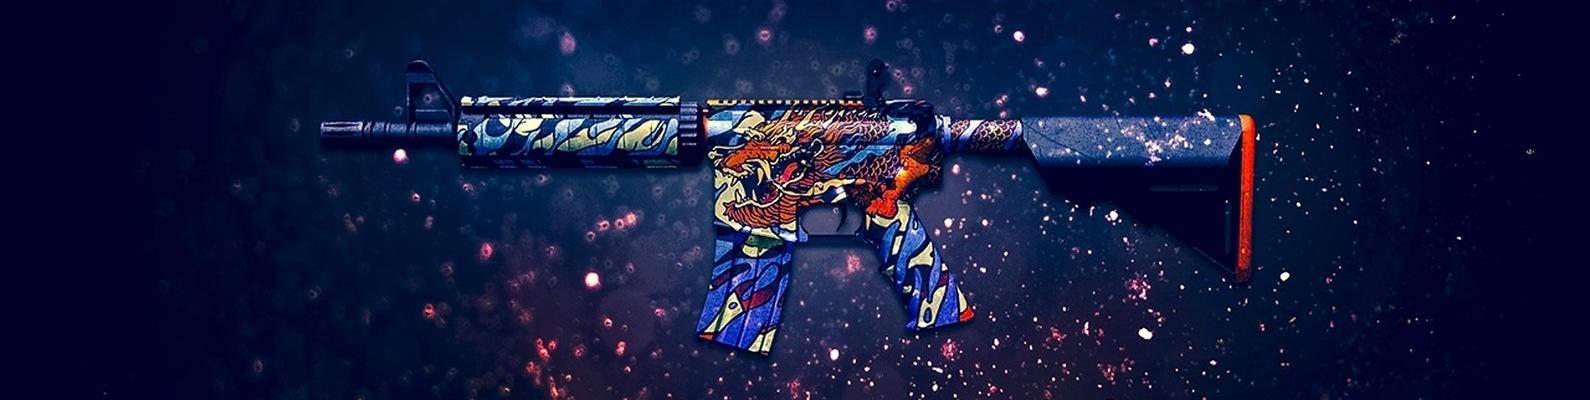 Cs Go Workshop Counter Strike Global Offensive Vkontakte